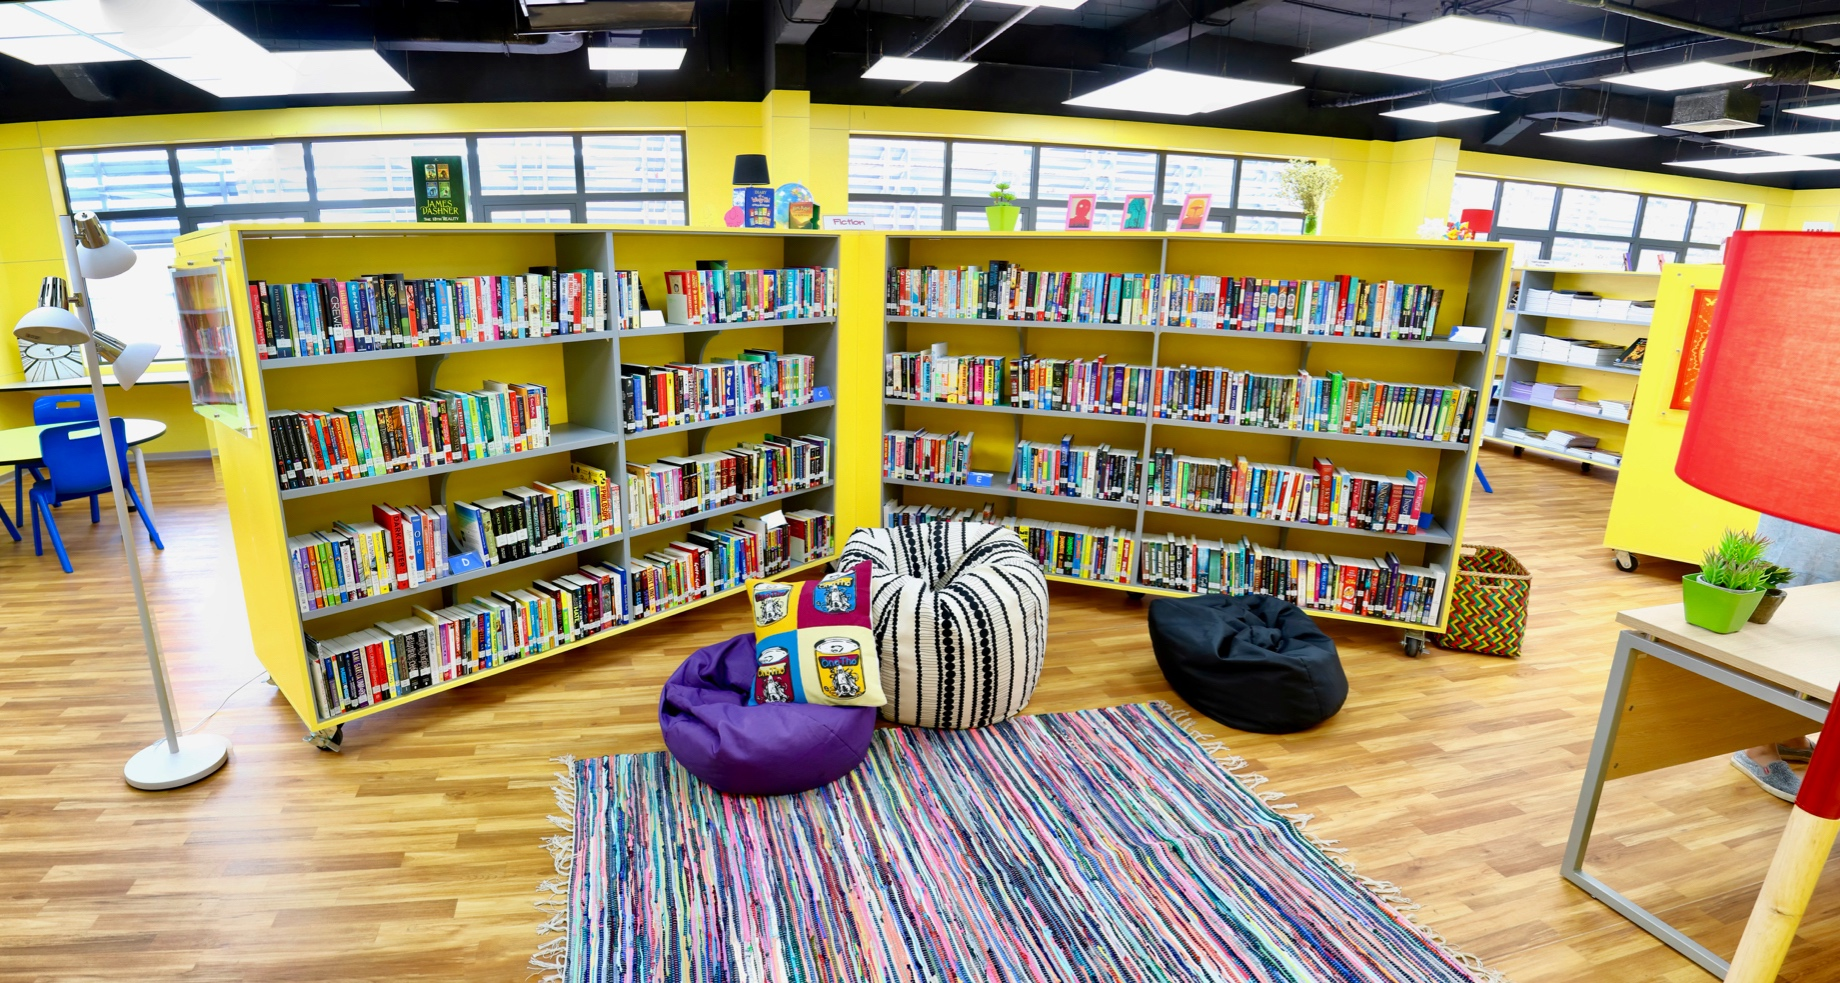 Library fiction books.jpg